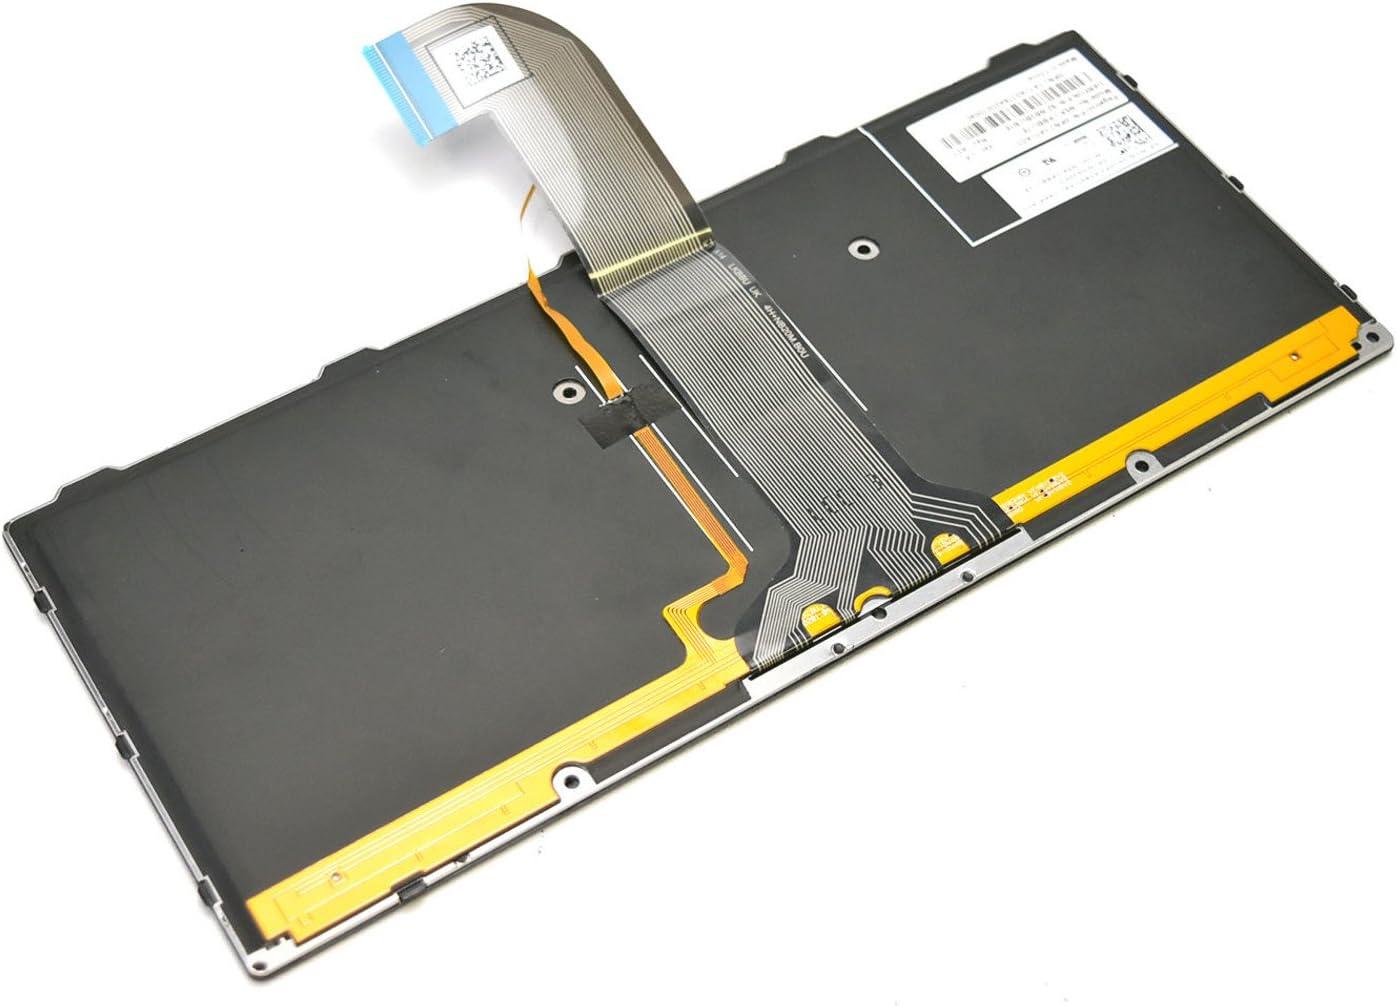 New 92HF3 Genuine OEM Dell LATIN Spanish Teclado Latitude Rugged 14-5404 7404 12-7204 7214 Rugged-Extreme Non-Sealed Backlit 82 Keyboard QWERTY NSK-LKBBU-1E Multimedia 9Z.NB2BU.B1E 0KNJ-1A1LA03 LAC